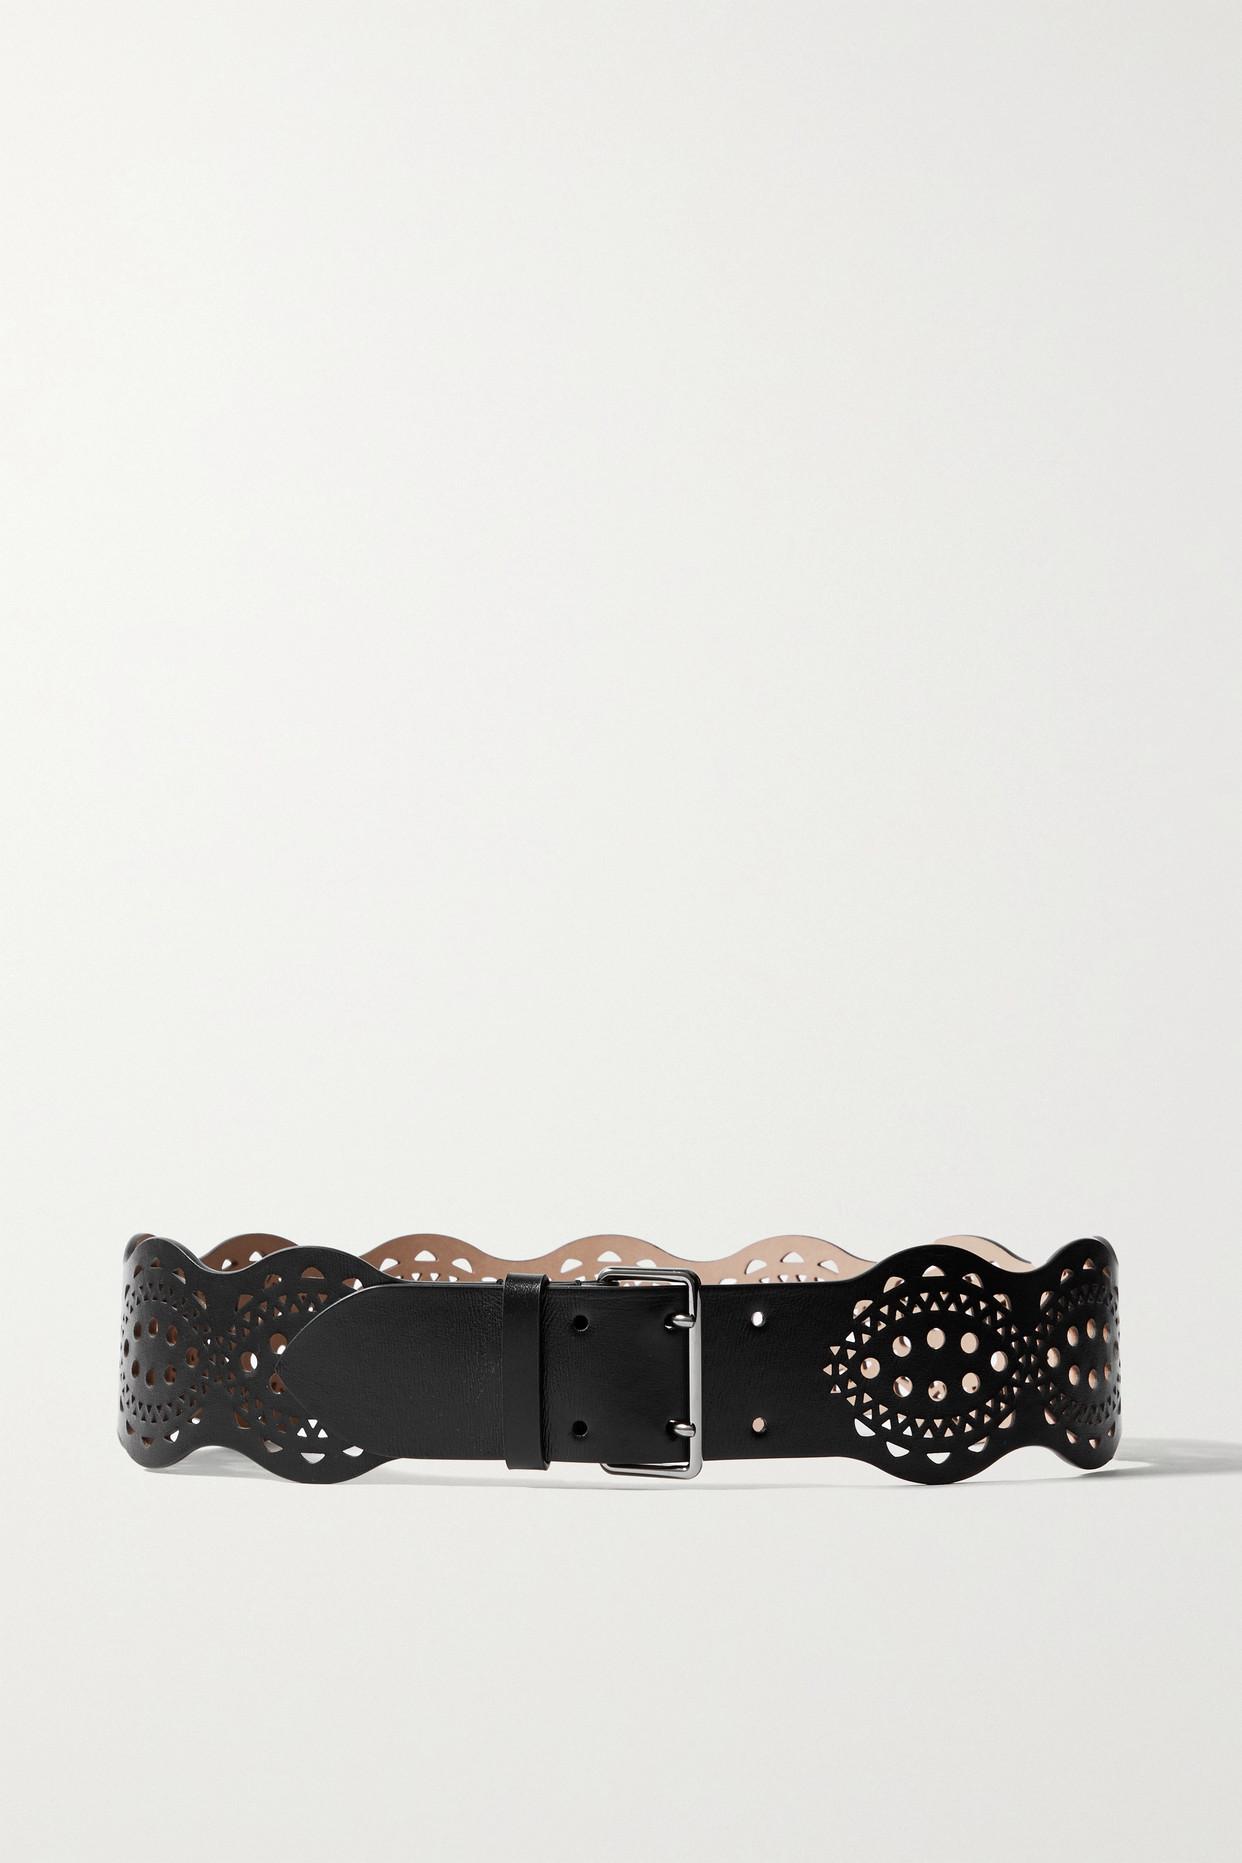 ALAÏA - Laser-cut Leather Waist Belt - Black - 70